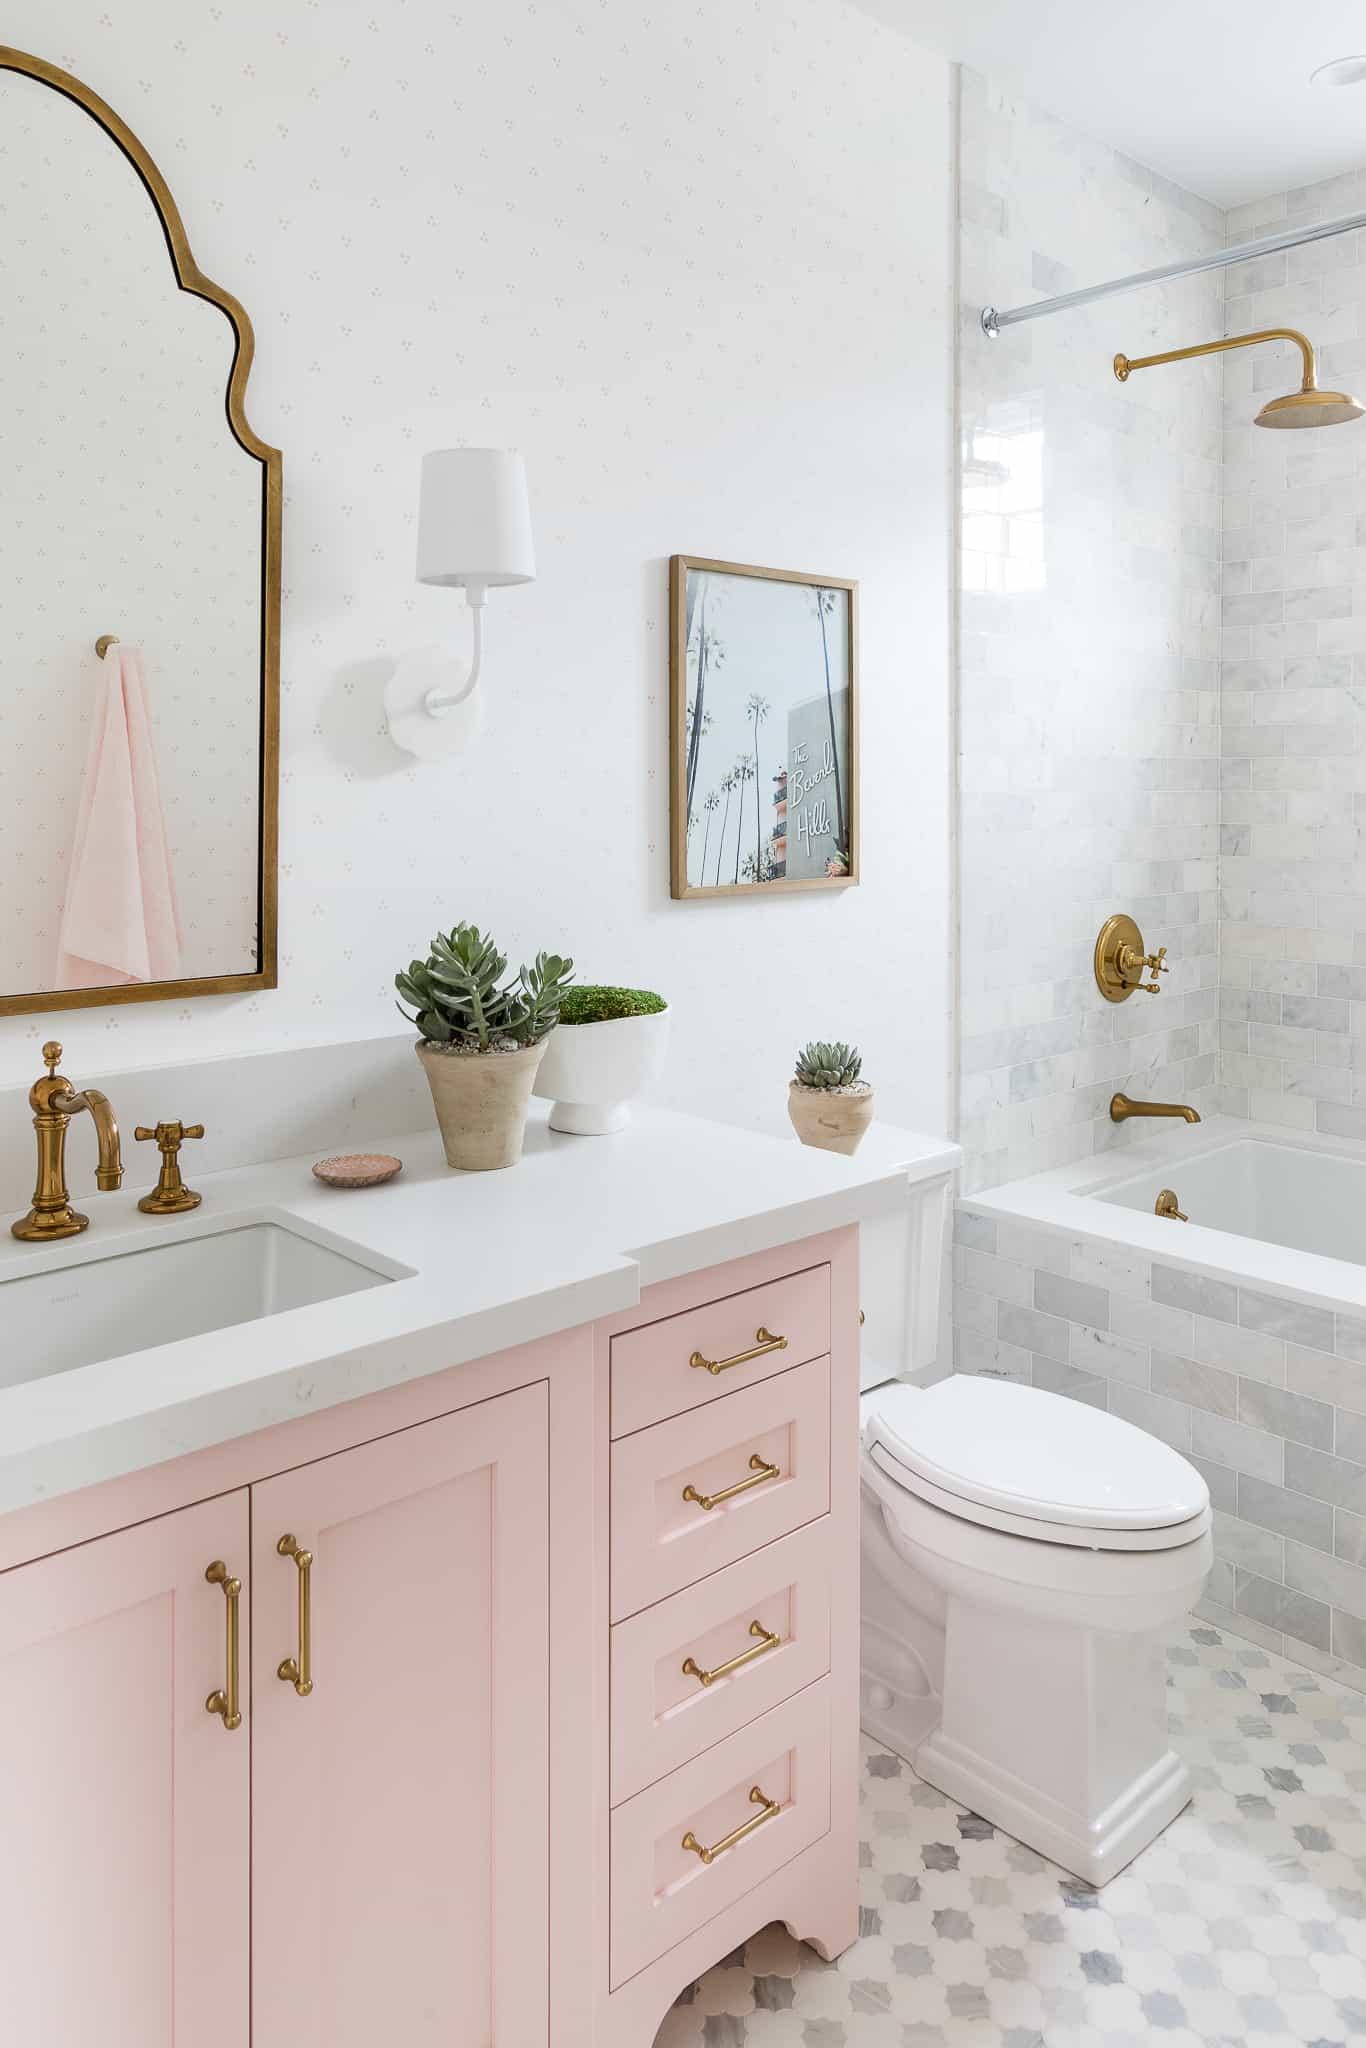 Windward Girls Bathroom Design - Mindy Gayer Design Co.